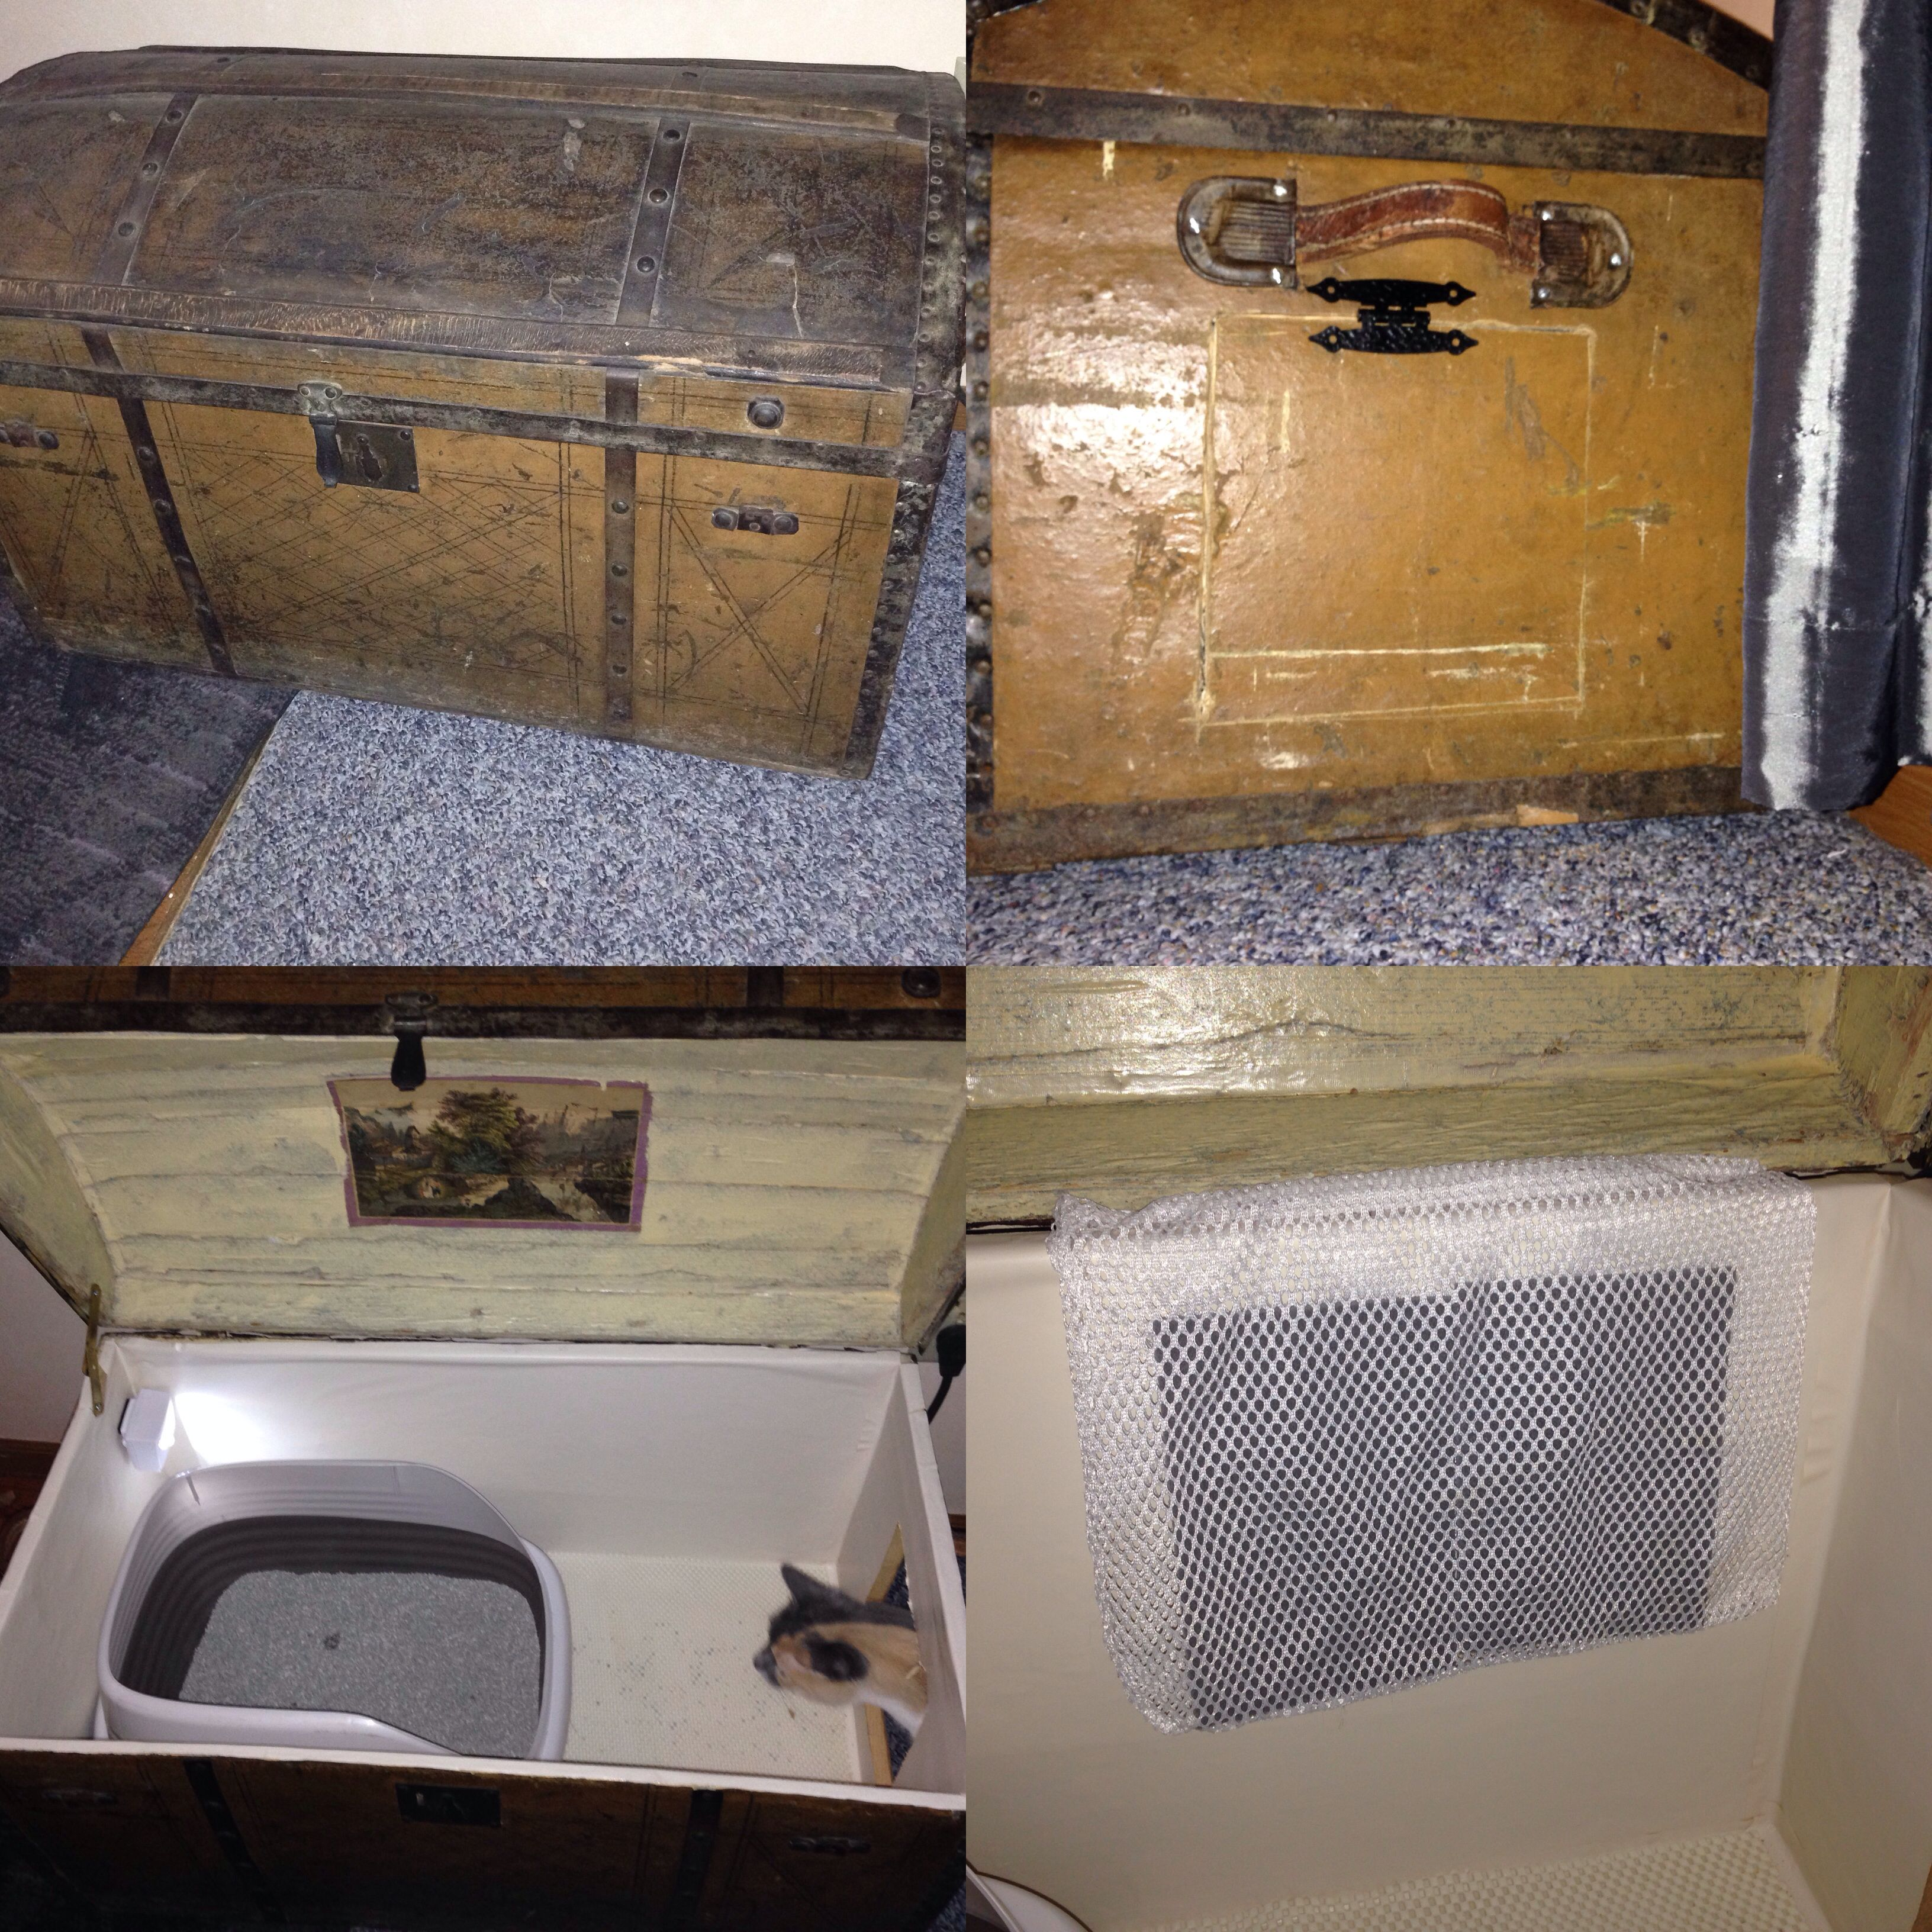 DIY hidden kitty box treasure chest trunk turned into lighted filtered spill proof & DIY hidden kitty box treasure chest trunk turned into lighted ... Aboutintivar.Com